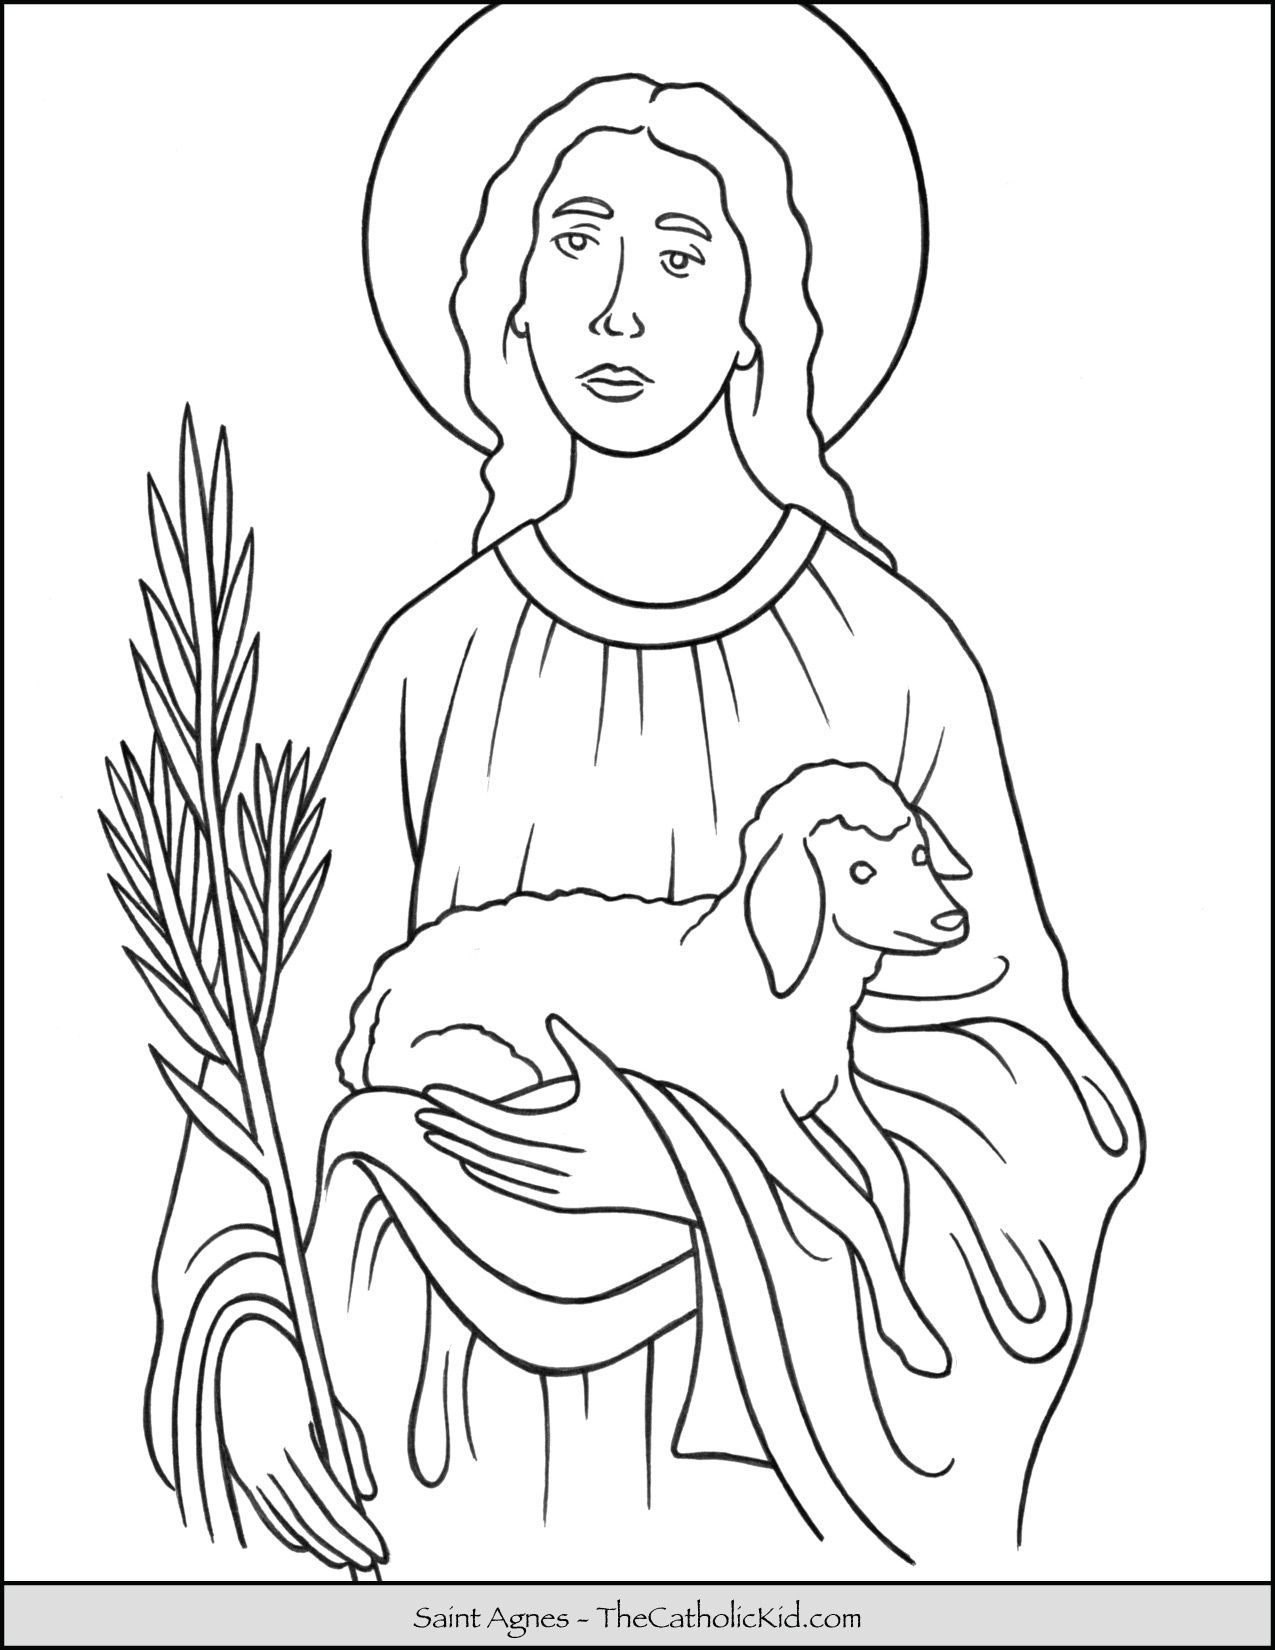 Saint Agnes Coloring Page Coloring Pages Christian Coloring Saint Coloring